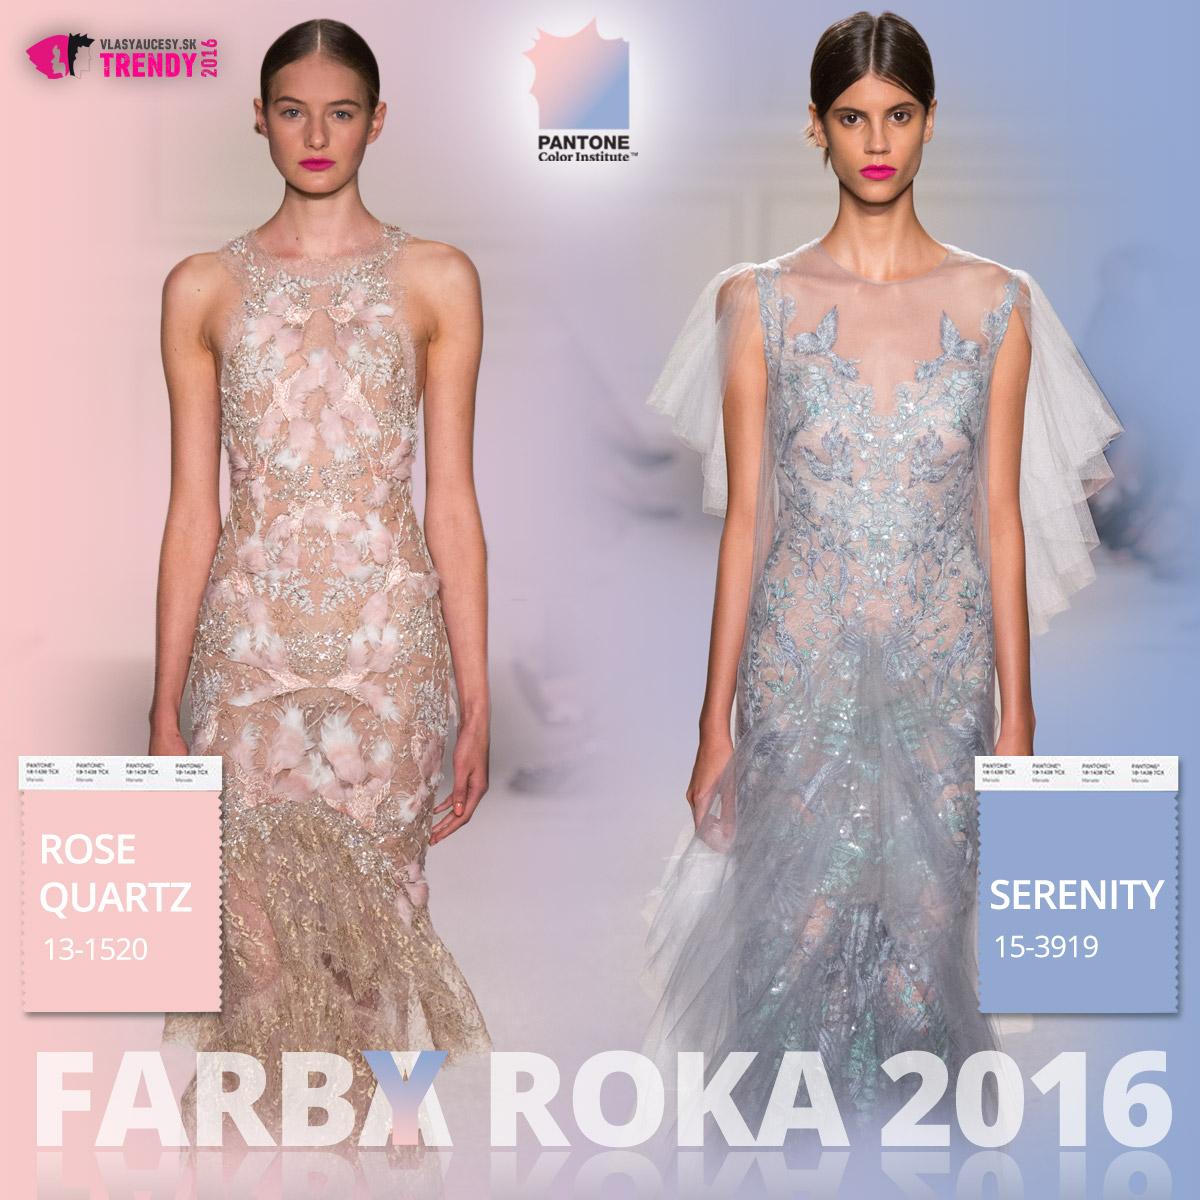 Farby roka 2016 a móda Marchesa – kolekcia jar / leto 2016.